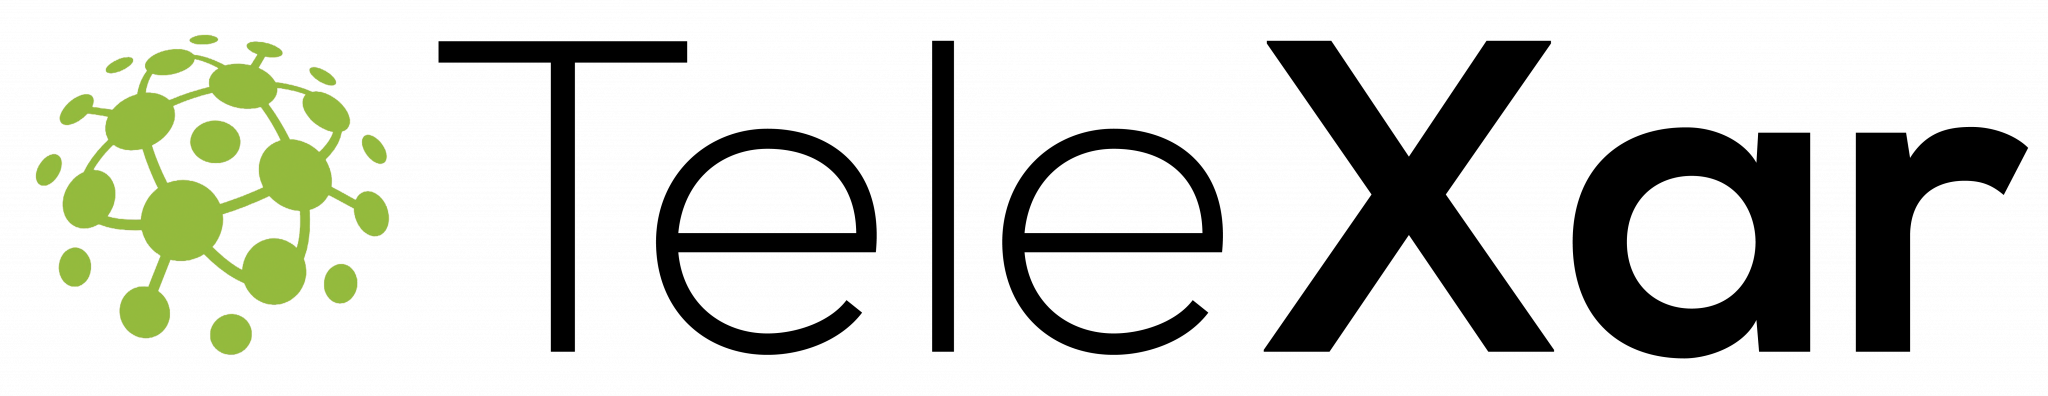 Telexar